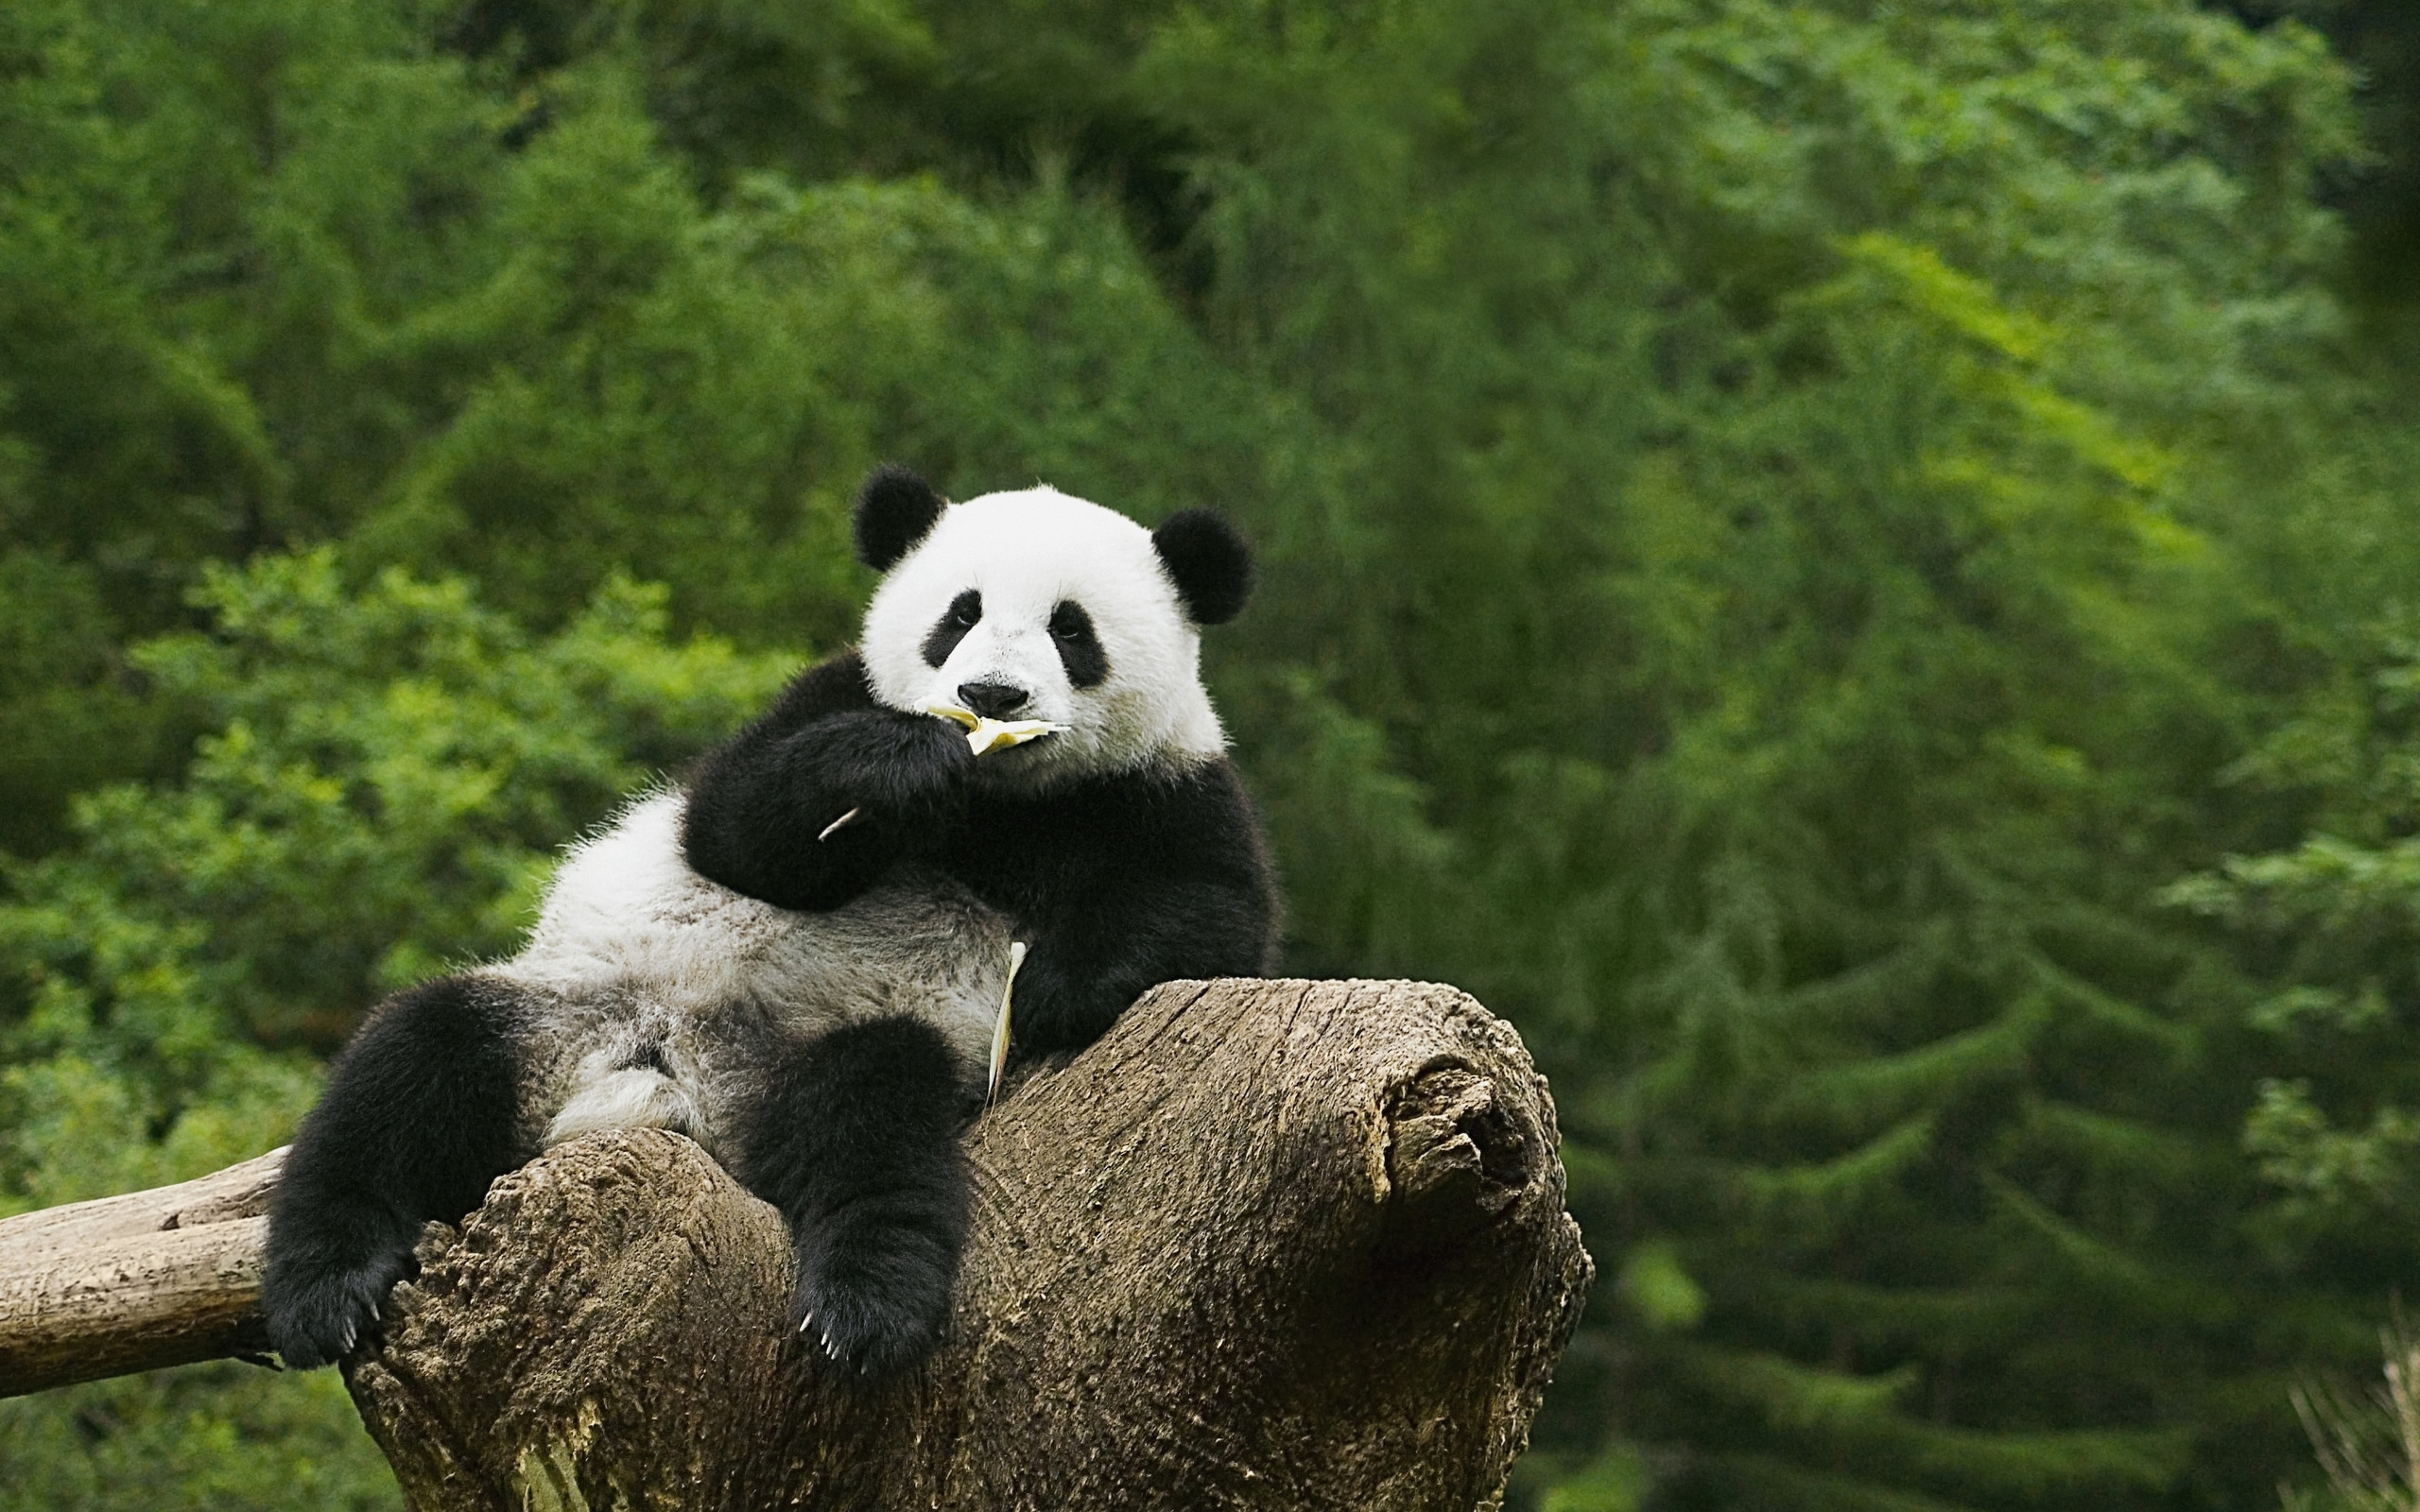 panda high quality wallpapers